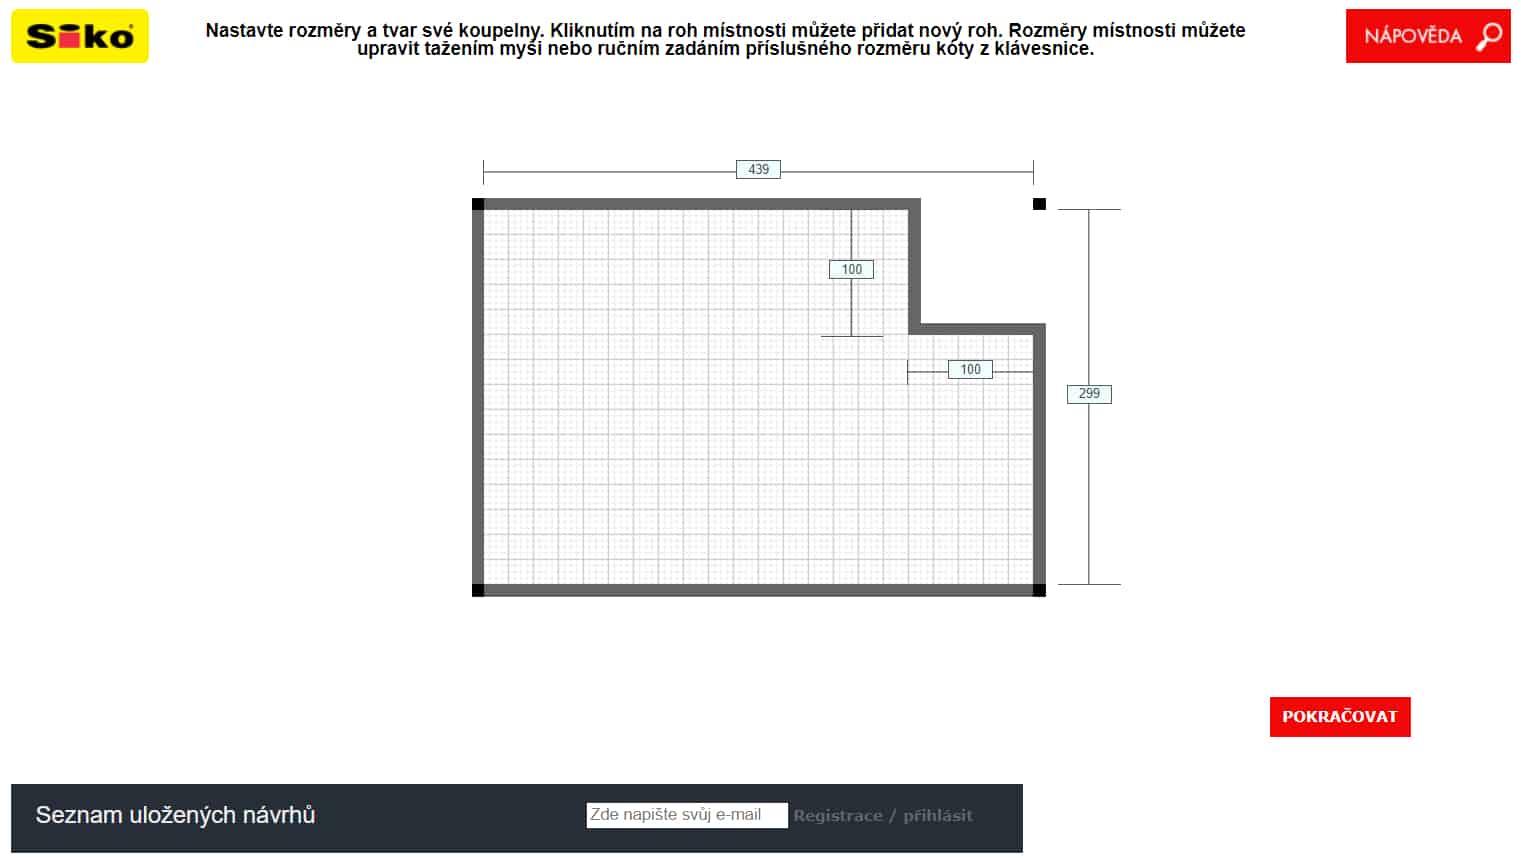 Siko konfigurátor koupelen půdorys recenze